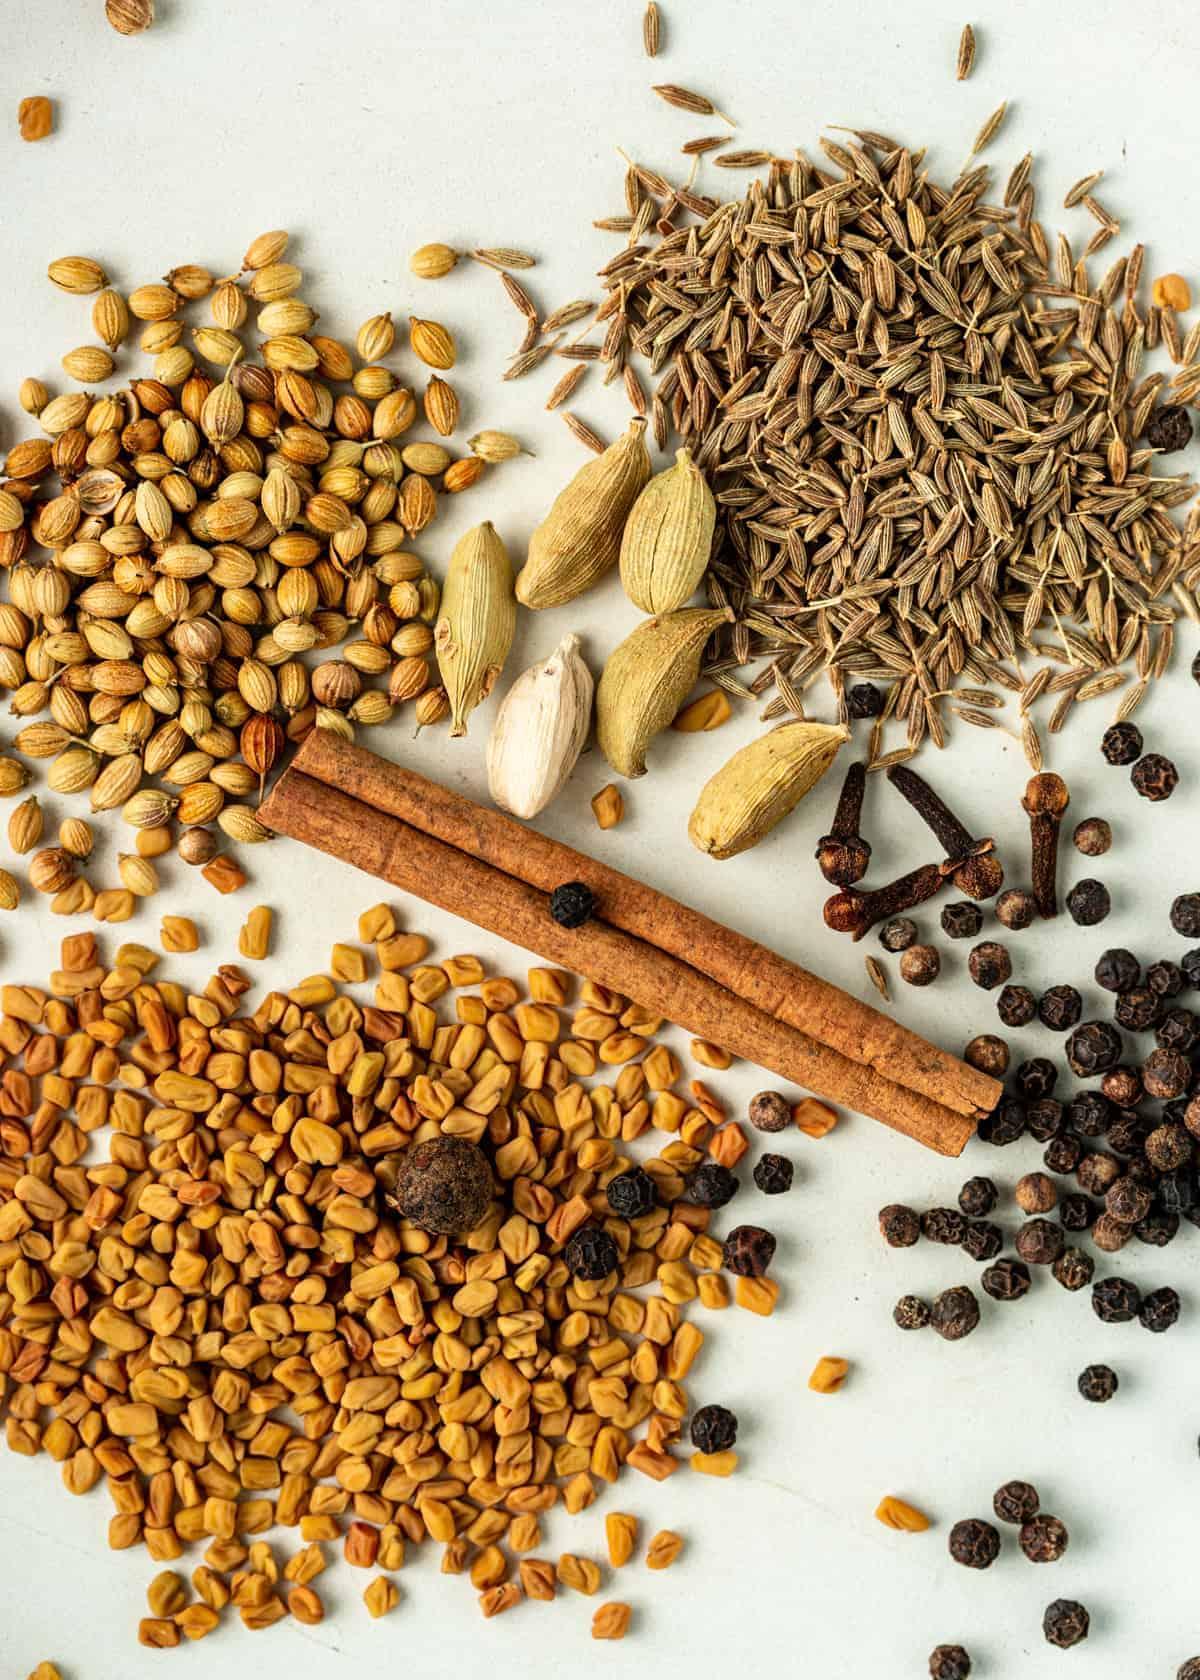 fresh cloves, cinnamon sticks, fenugreek and other ingredients to make Ethiopian seasoning blend